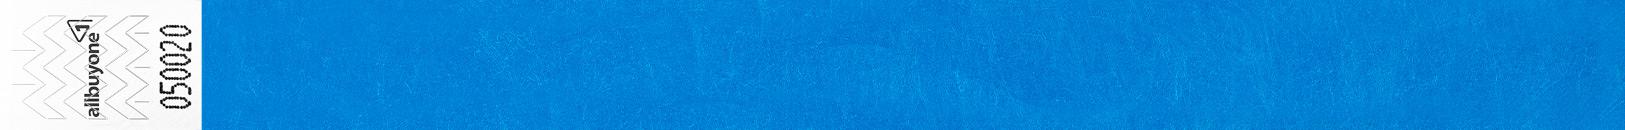 https://cdn.allbuyone.com/media/image/26/8a/c2/tyvek-19mm-1625x130px-blau.jpg